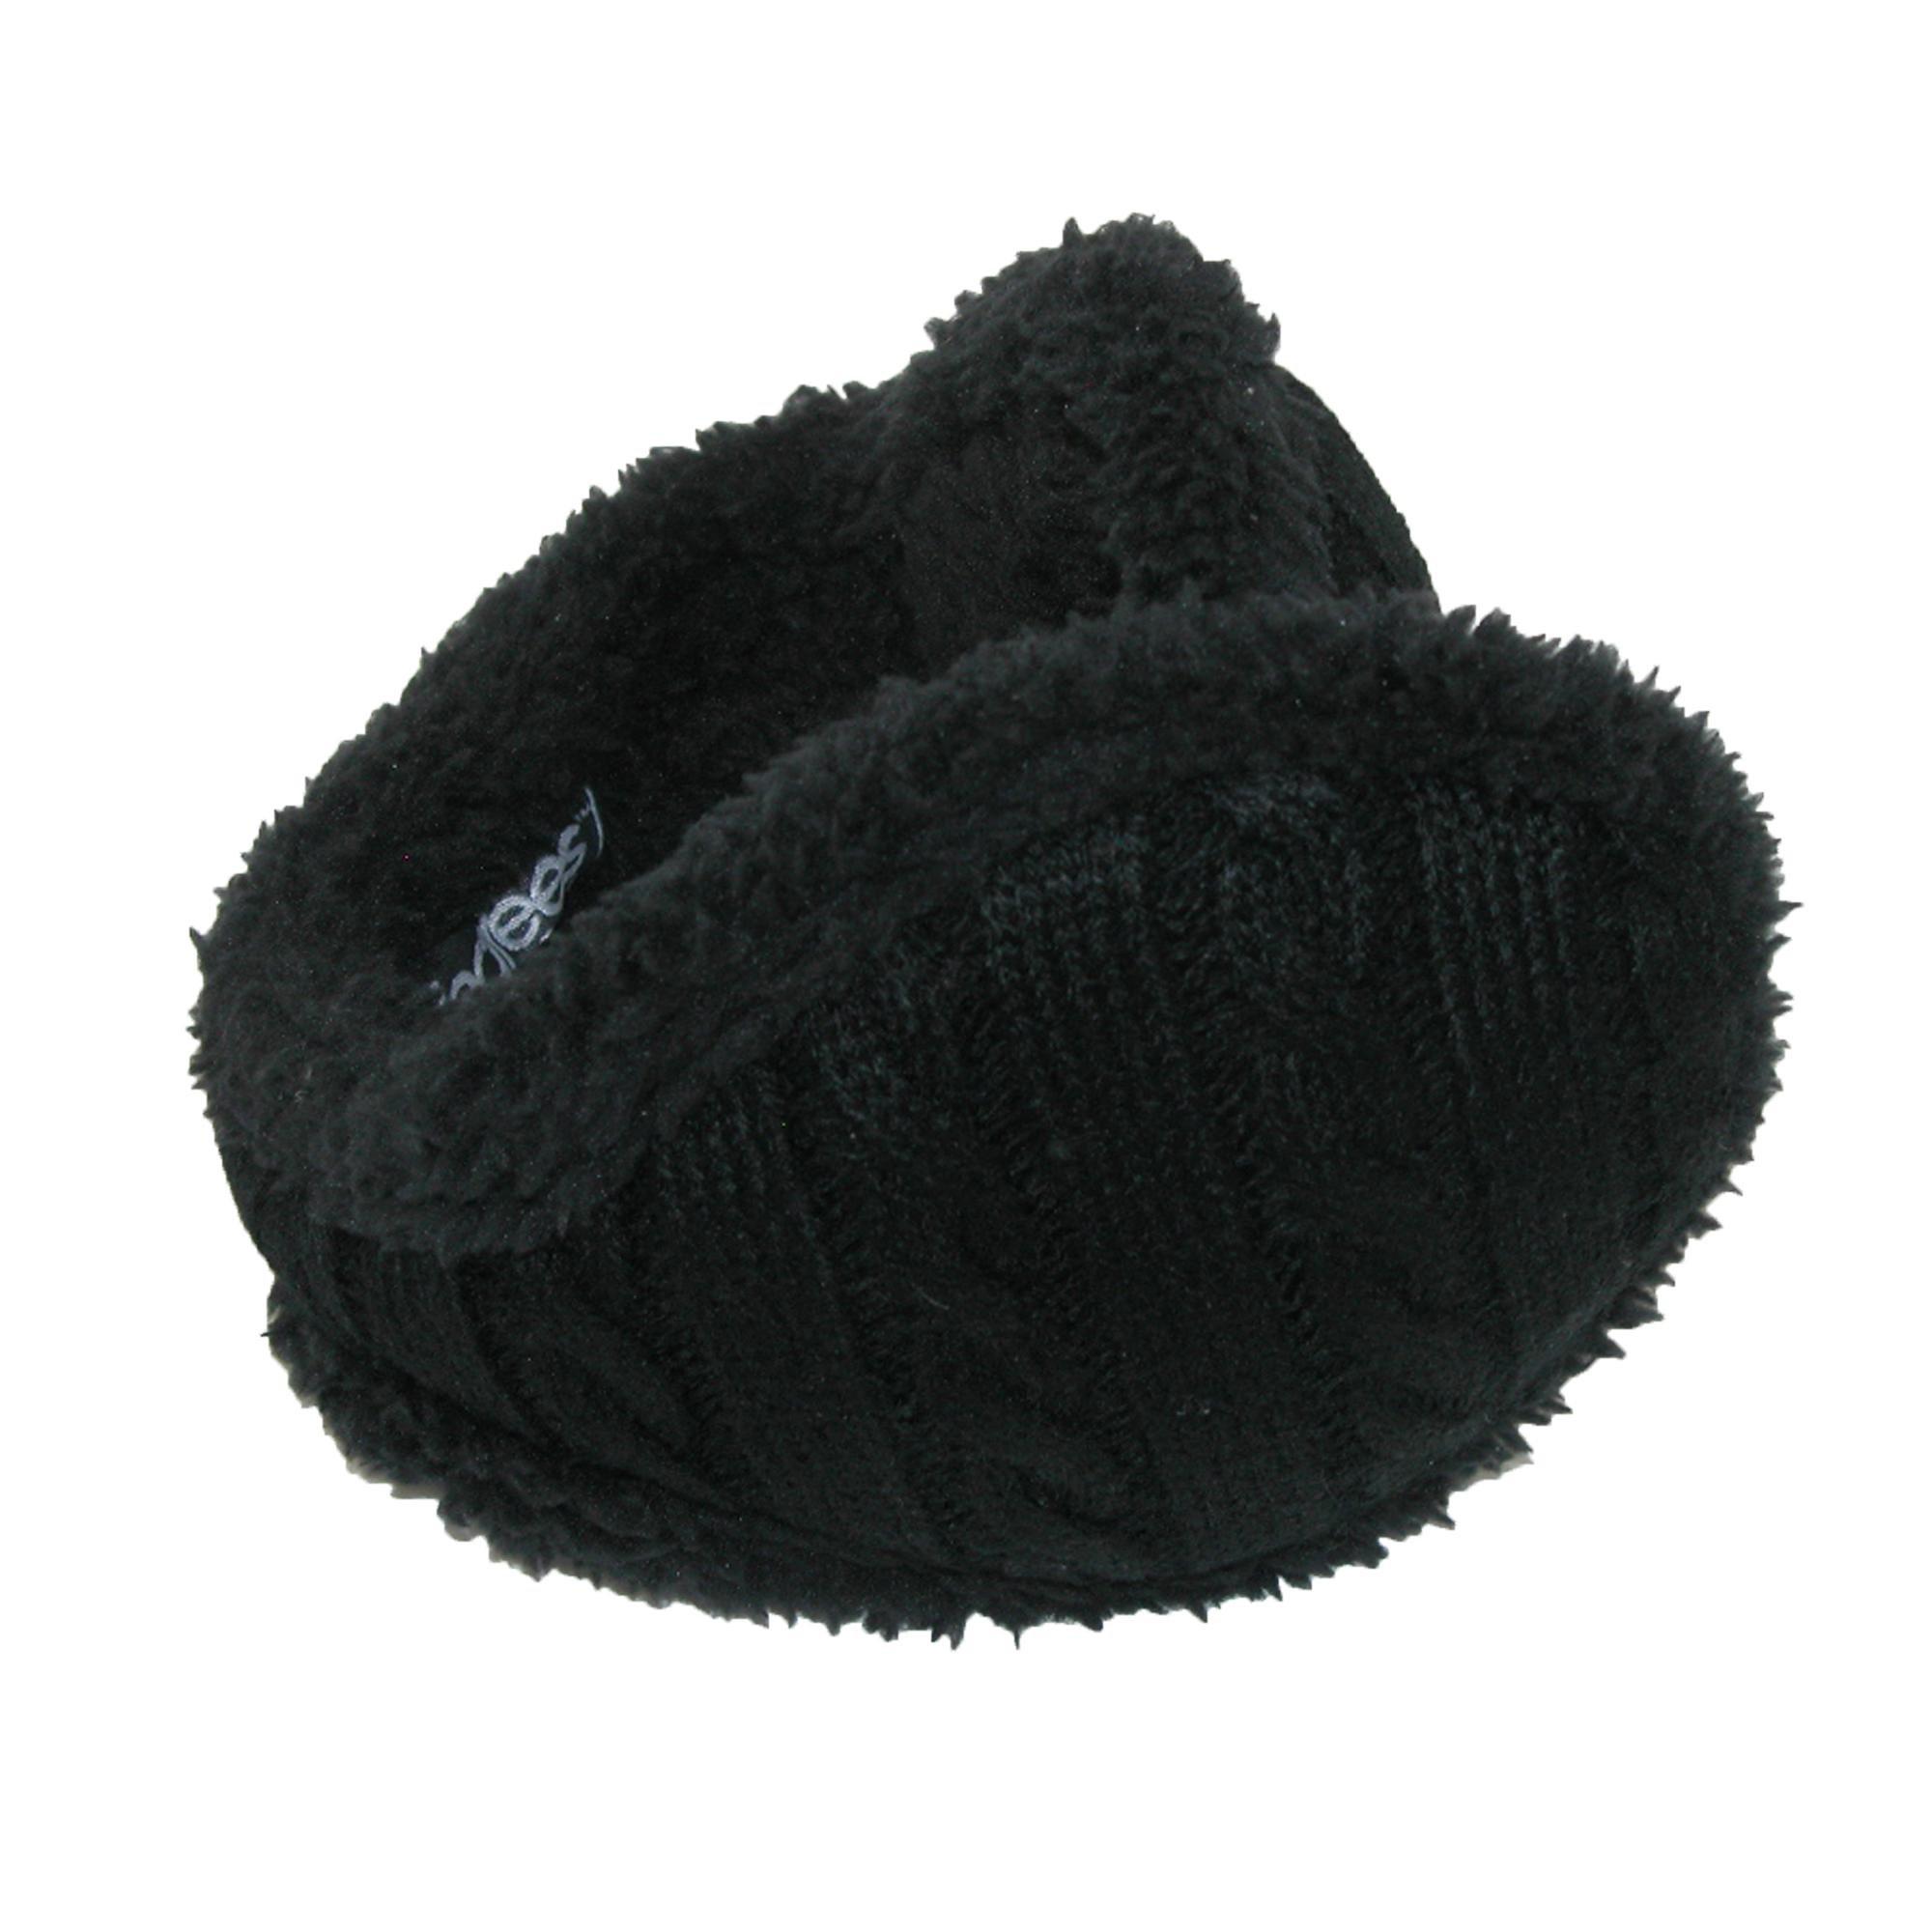 180s Women's Cable Knit Ear Warmers, Black